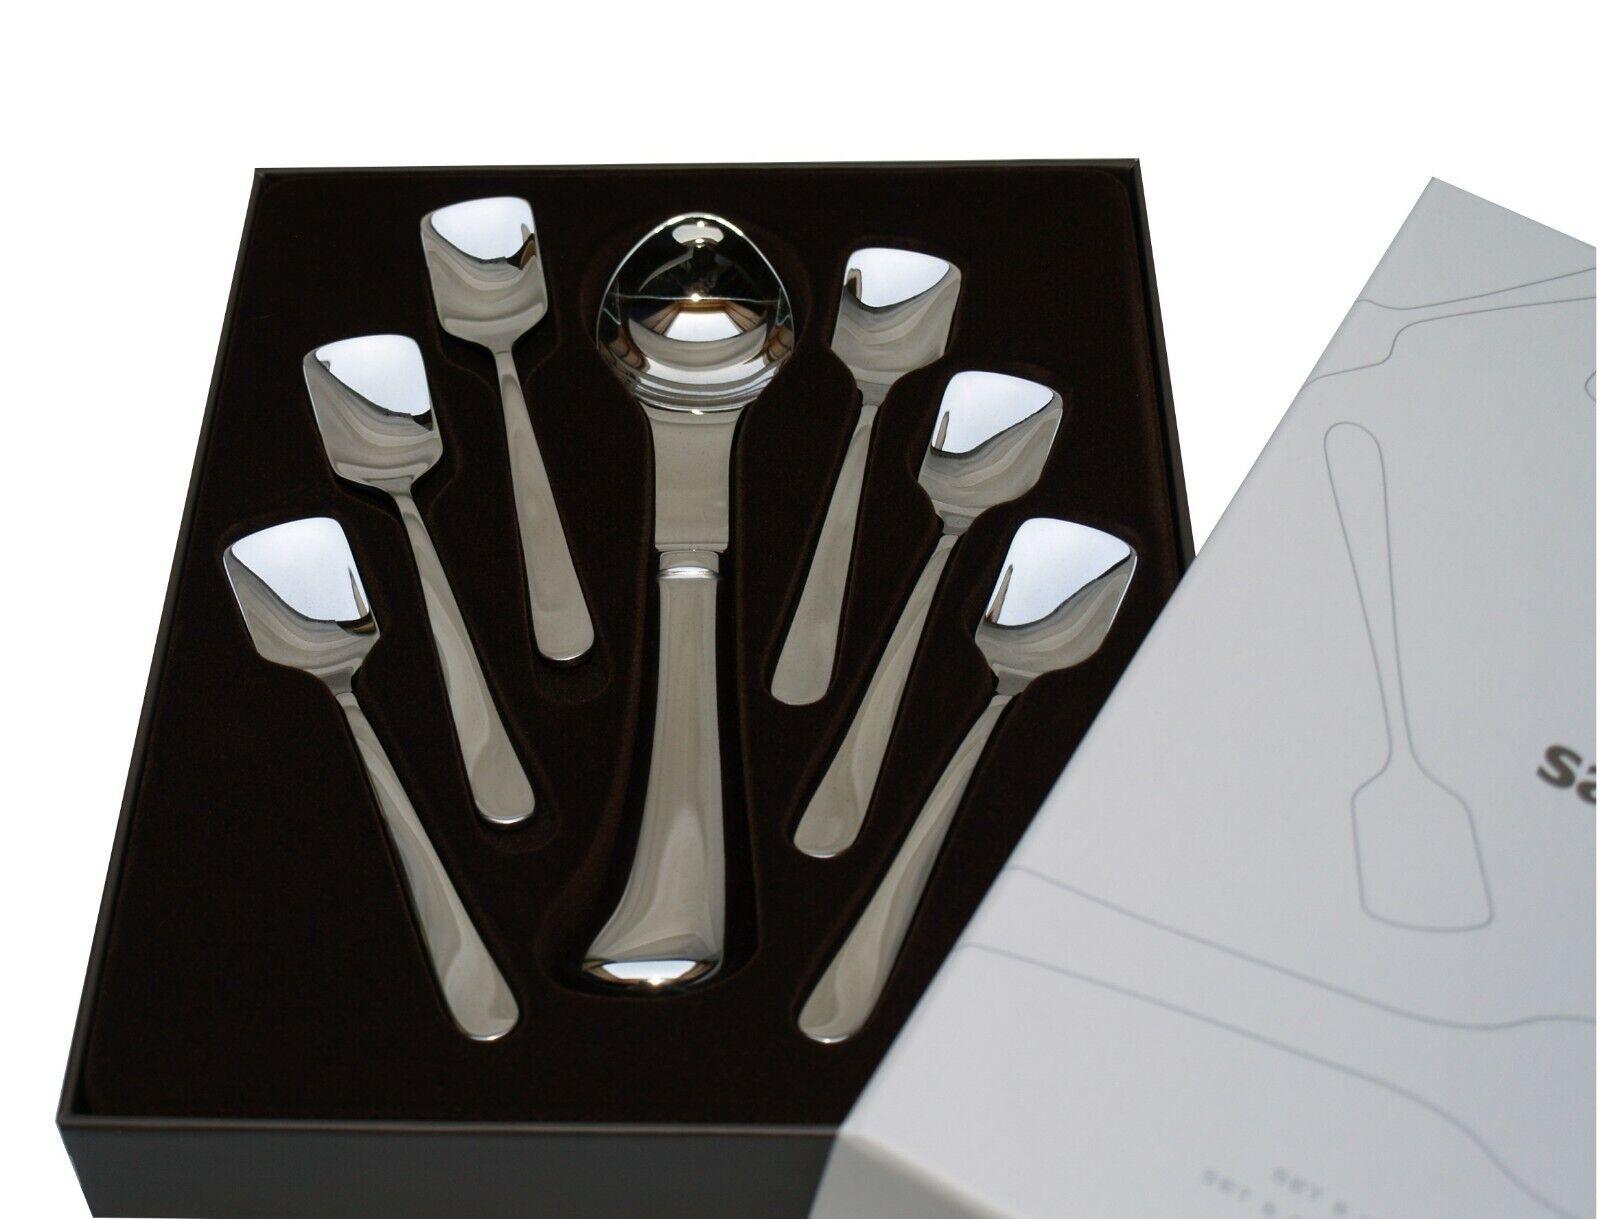 WMF 1 Würzburger Facette 90 Silber Tassenlöffel Sahnelöffel 16,6 cm Note1-2 TOP Home Cookware, Dining & Bar Supplies Cutlery